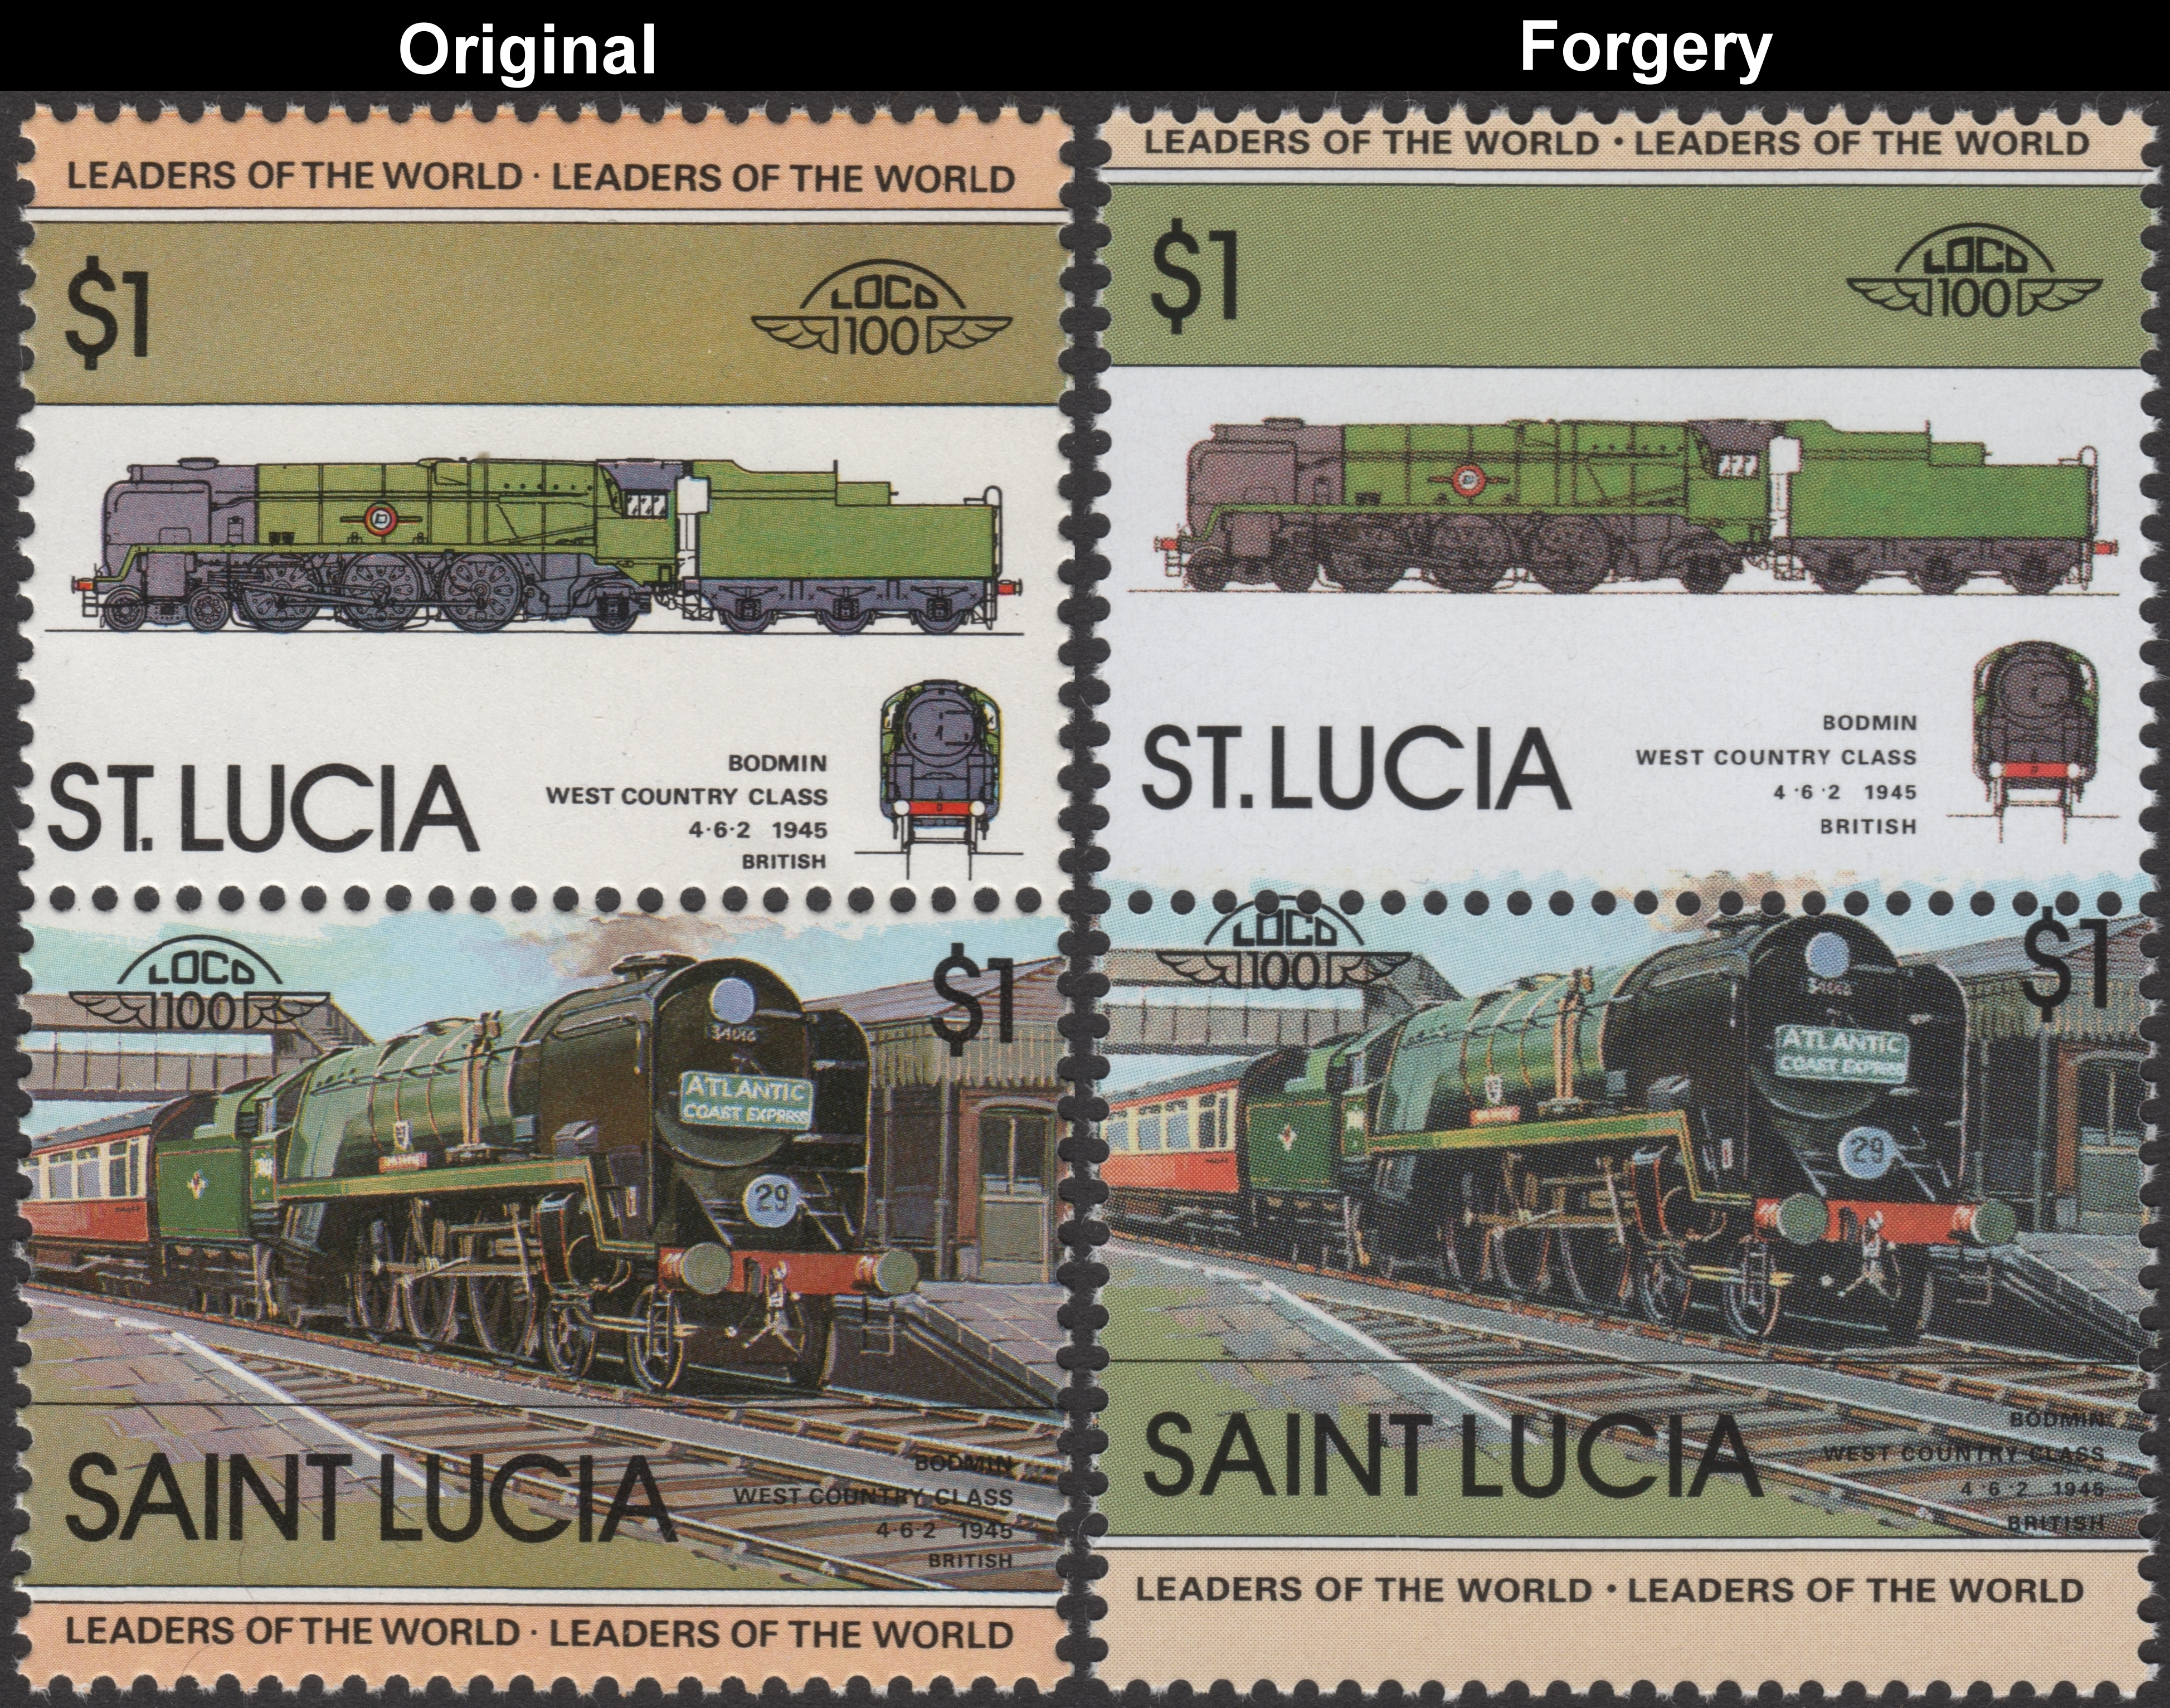 Saint Lucia 1983 Locomotives 1st Series Stamp Forgeries